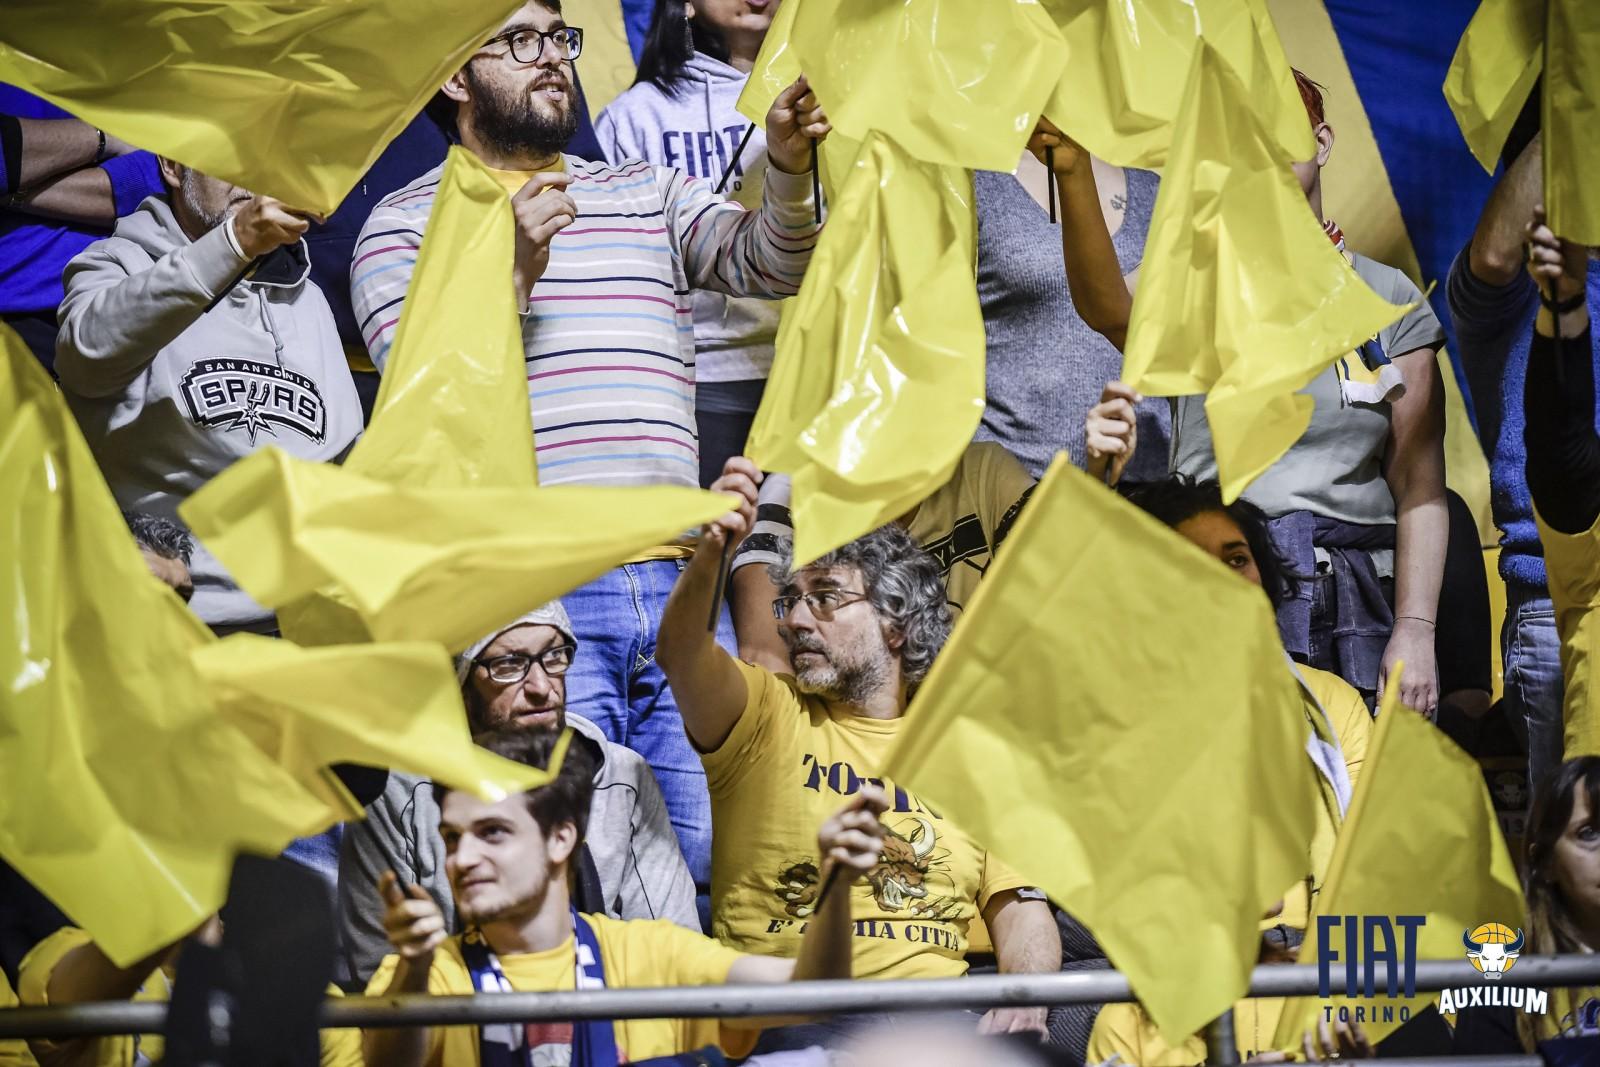 Serie A: Fiat Torino - Vanoli Cremona